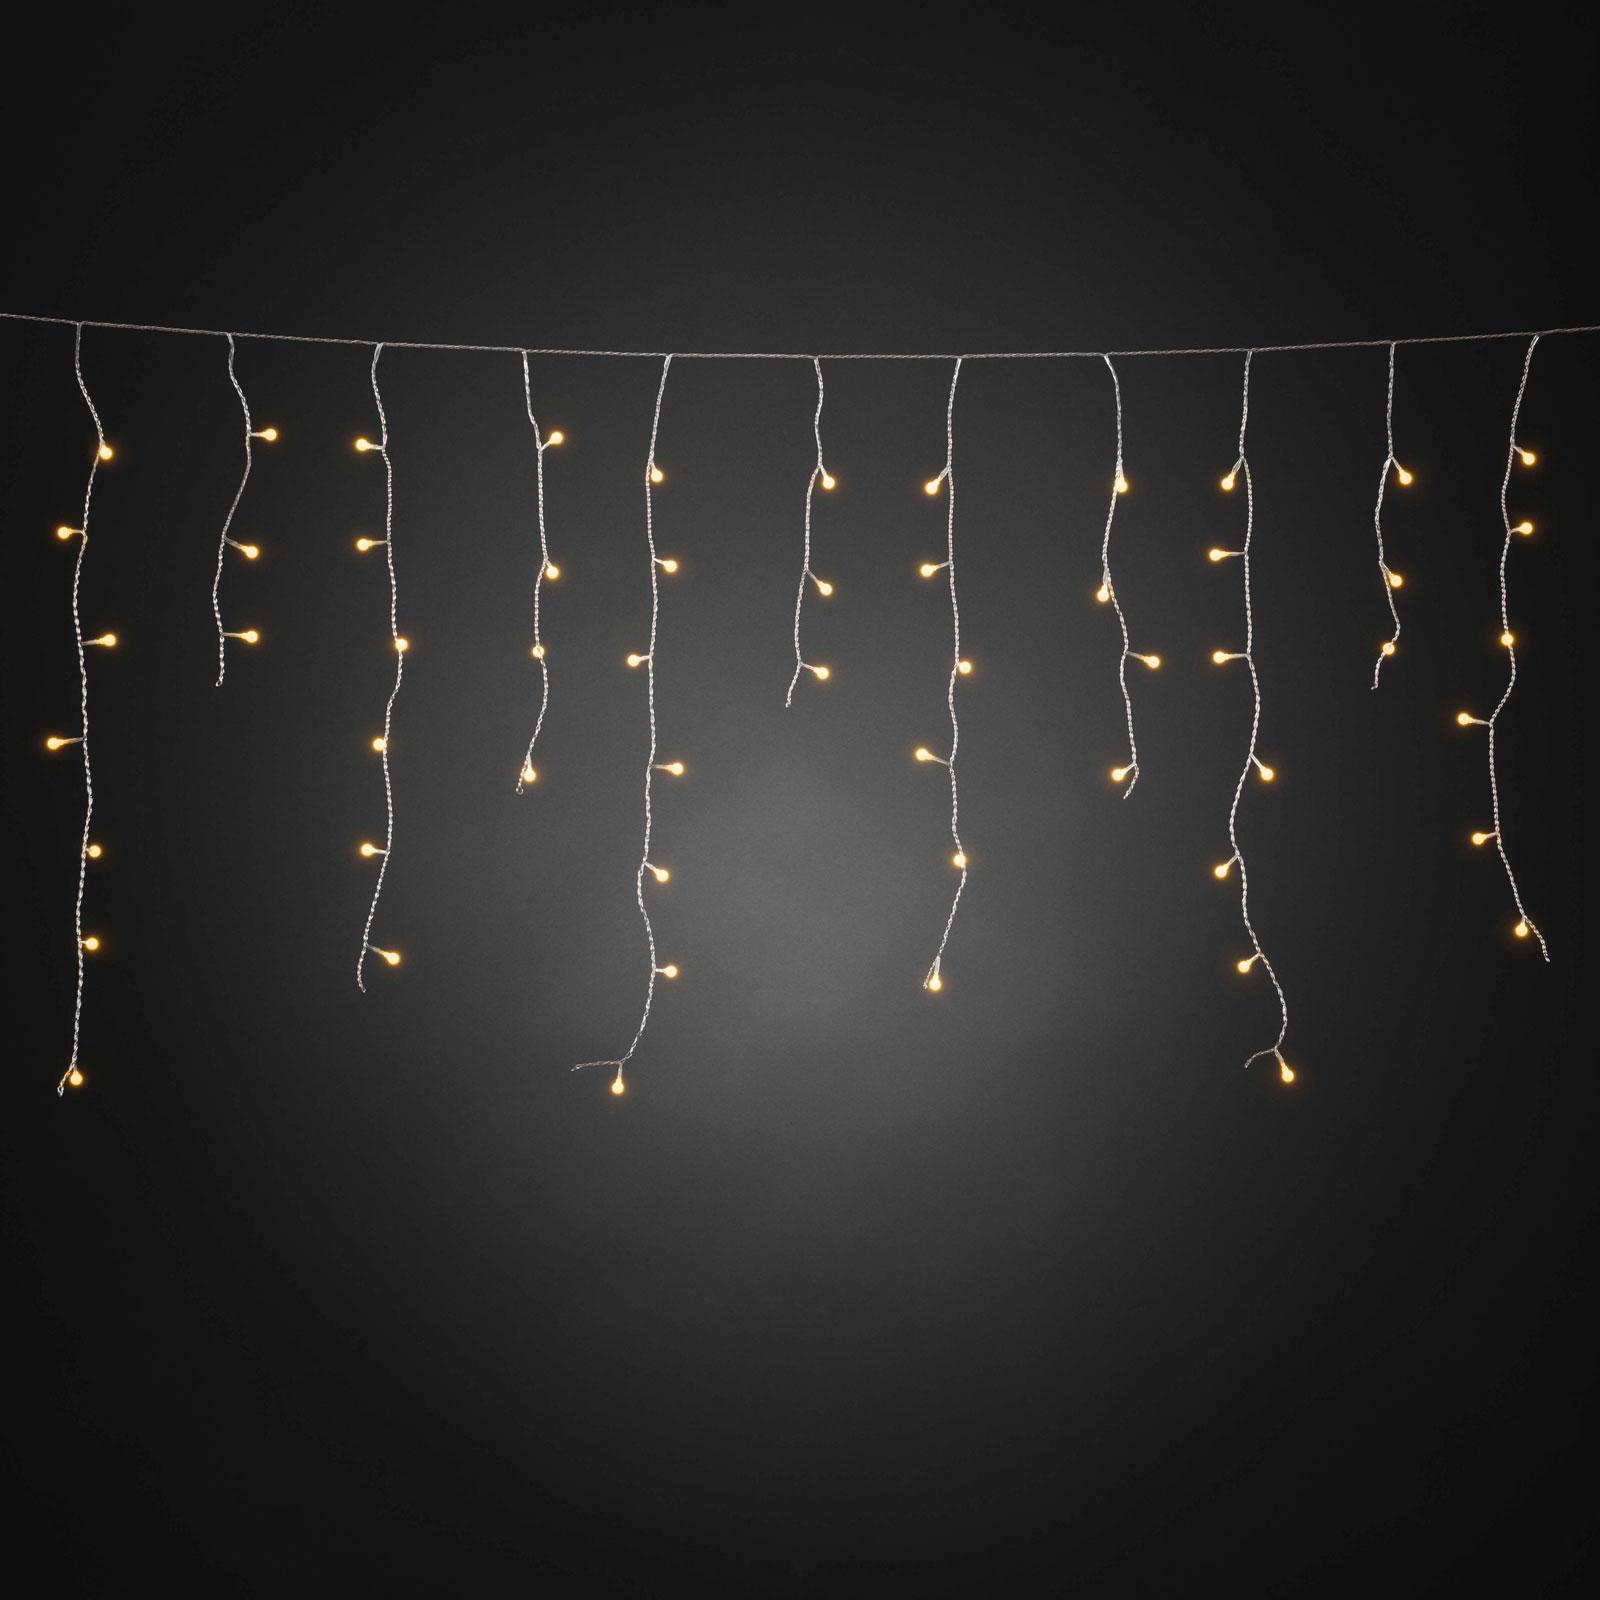 LED-draperi isregn, kan styras via app